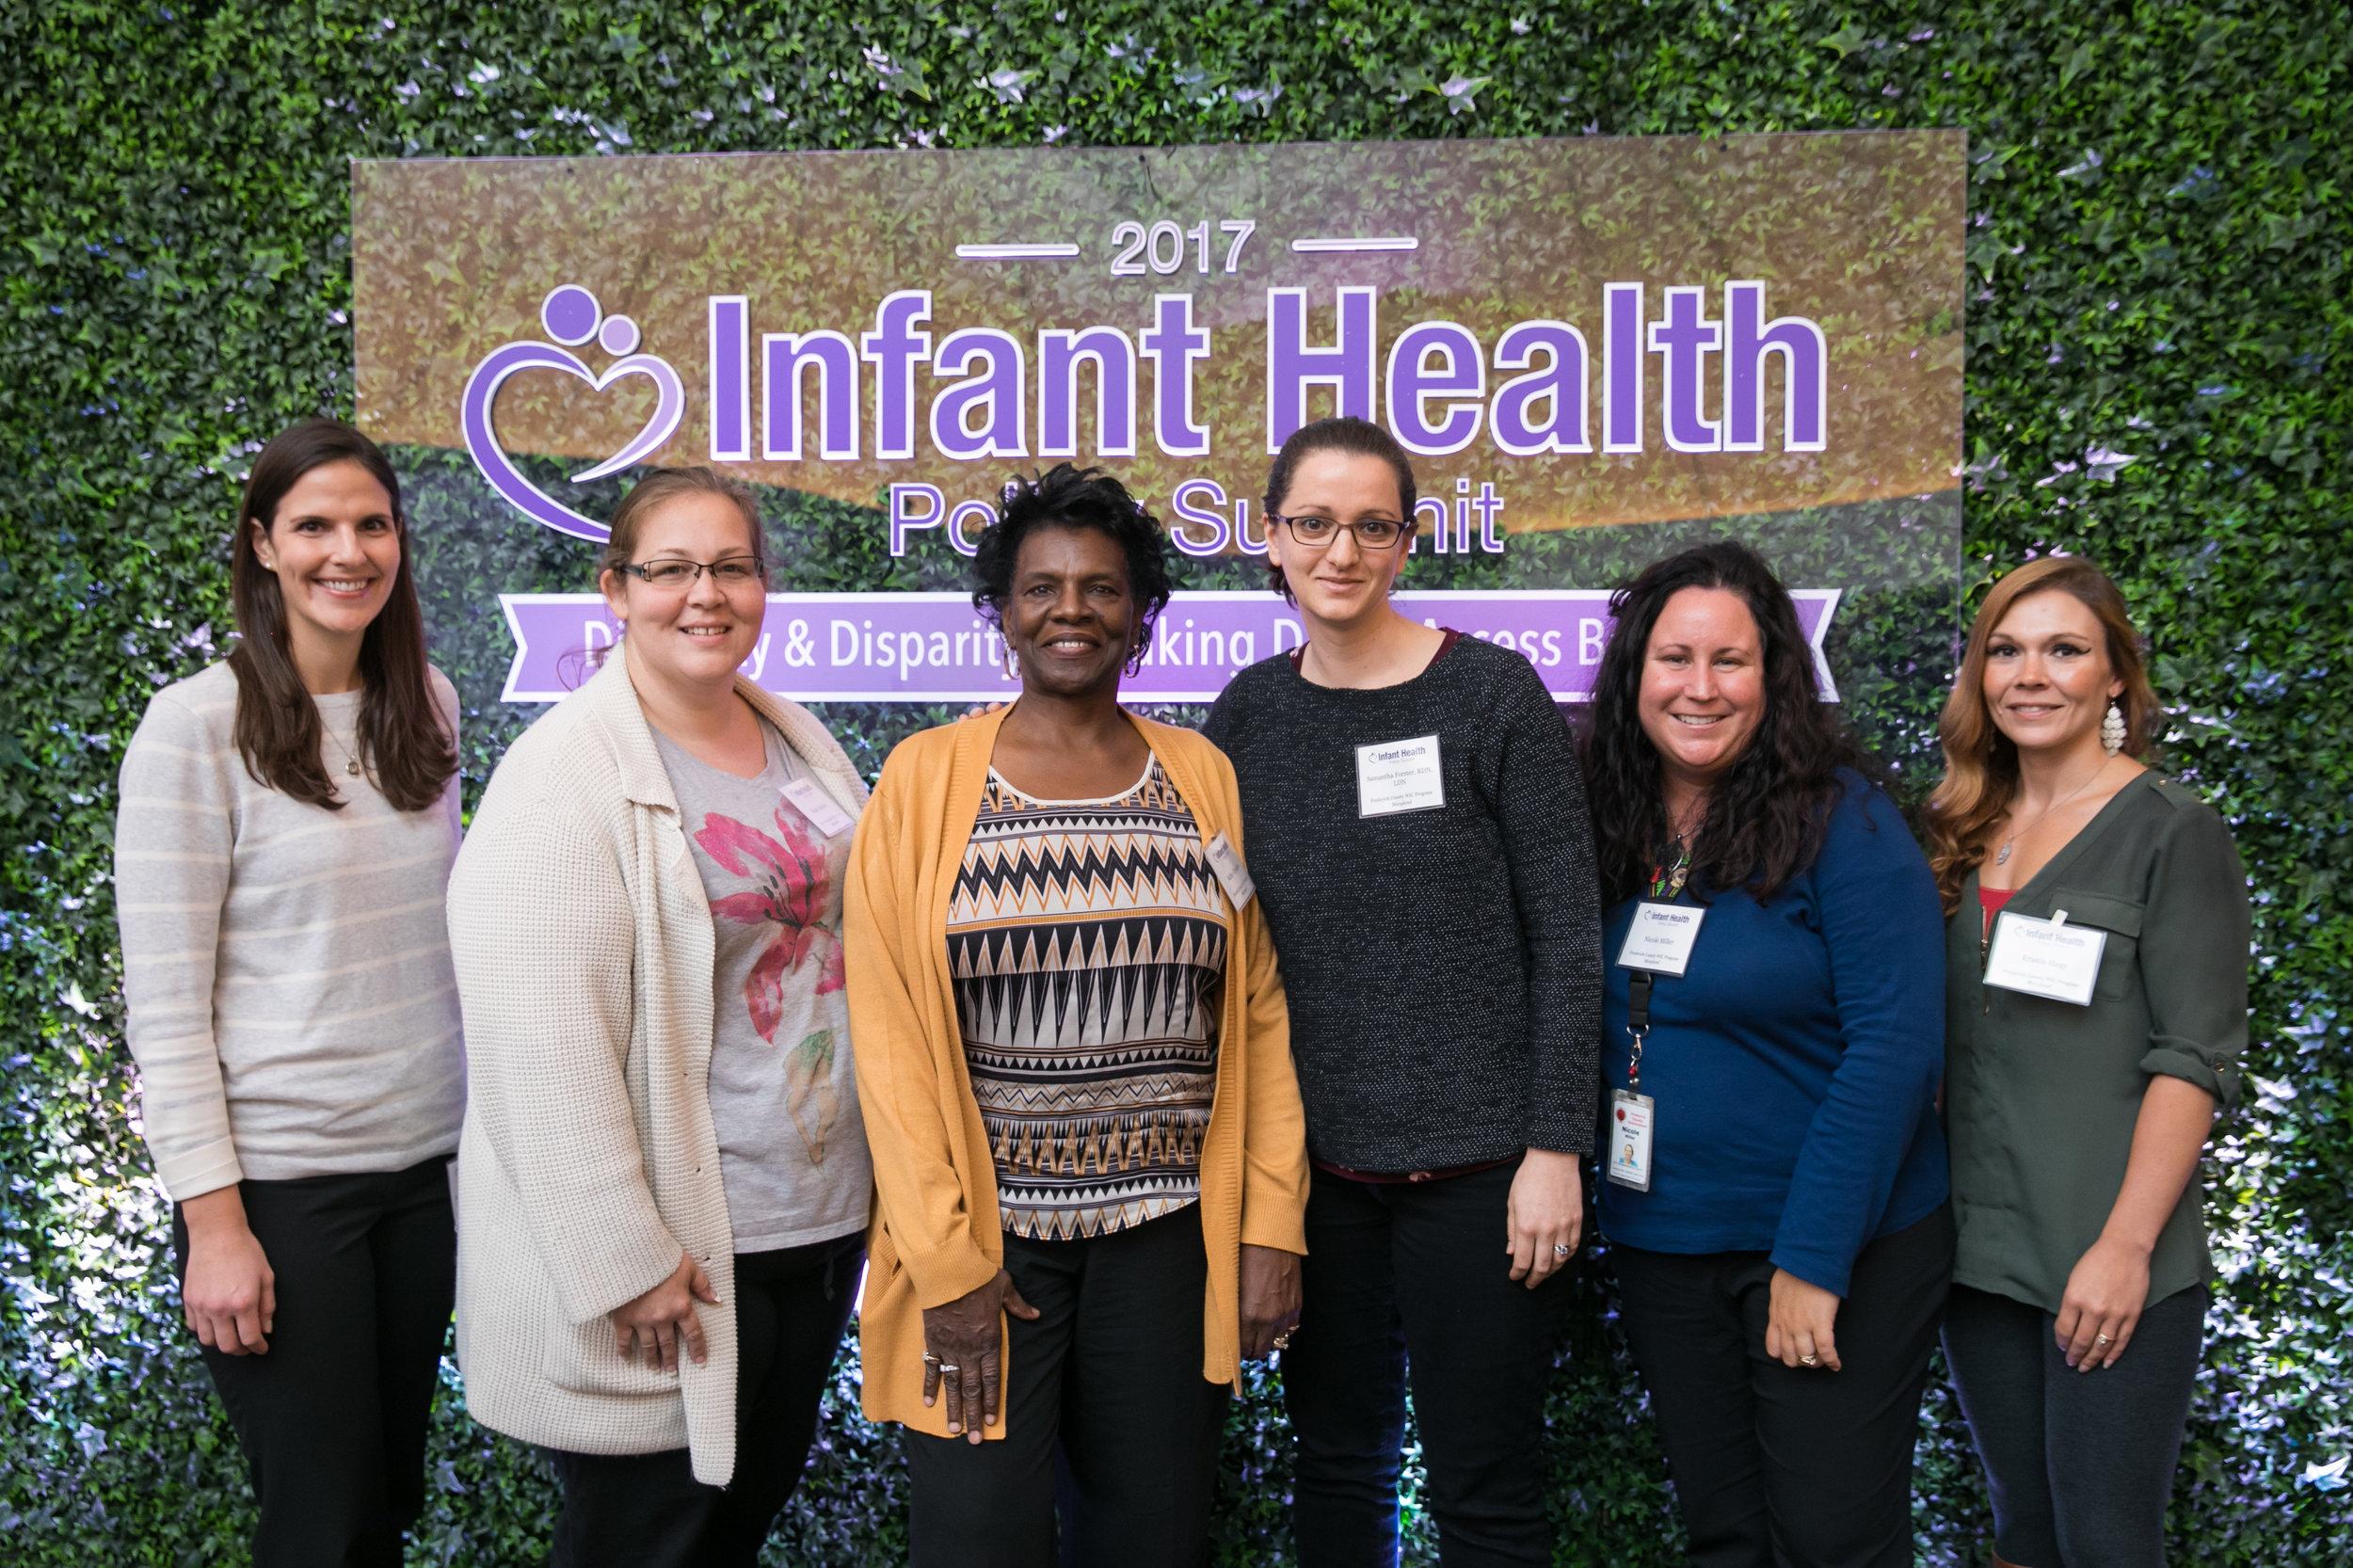 Infant Health Policy Summit - Jason Dixson Photography - 101722 - 0337.jpg